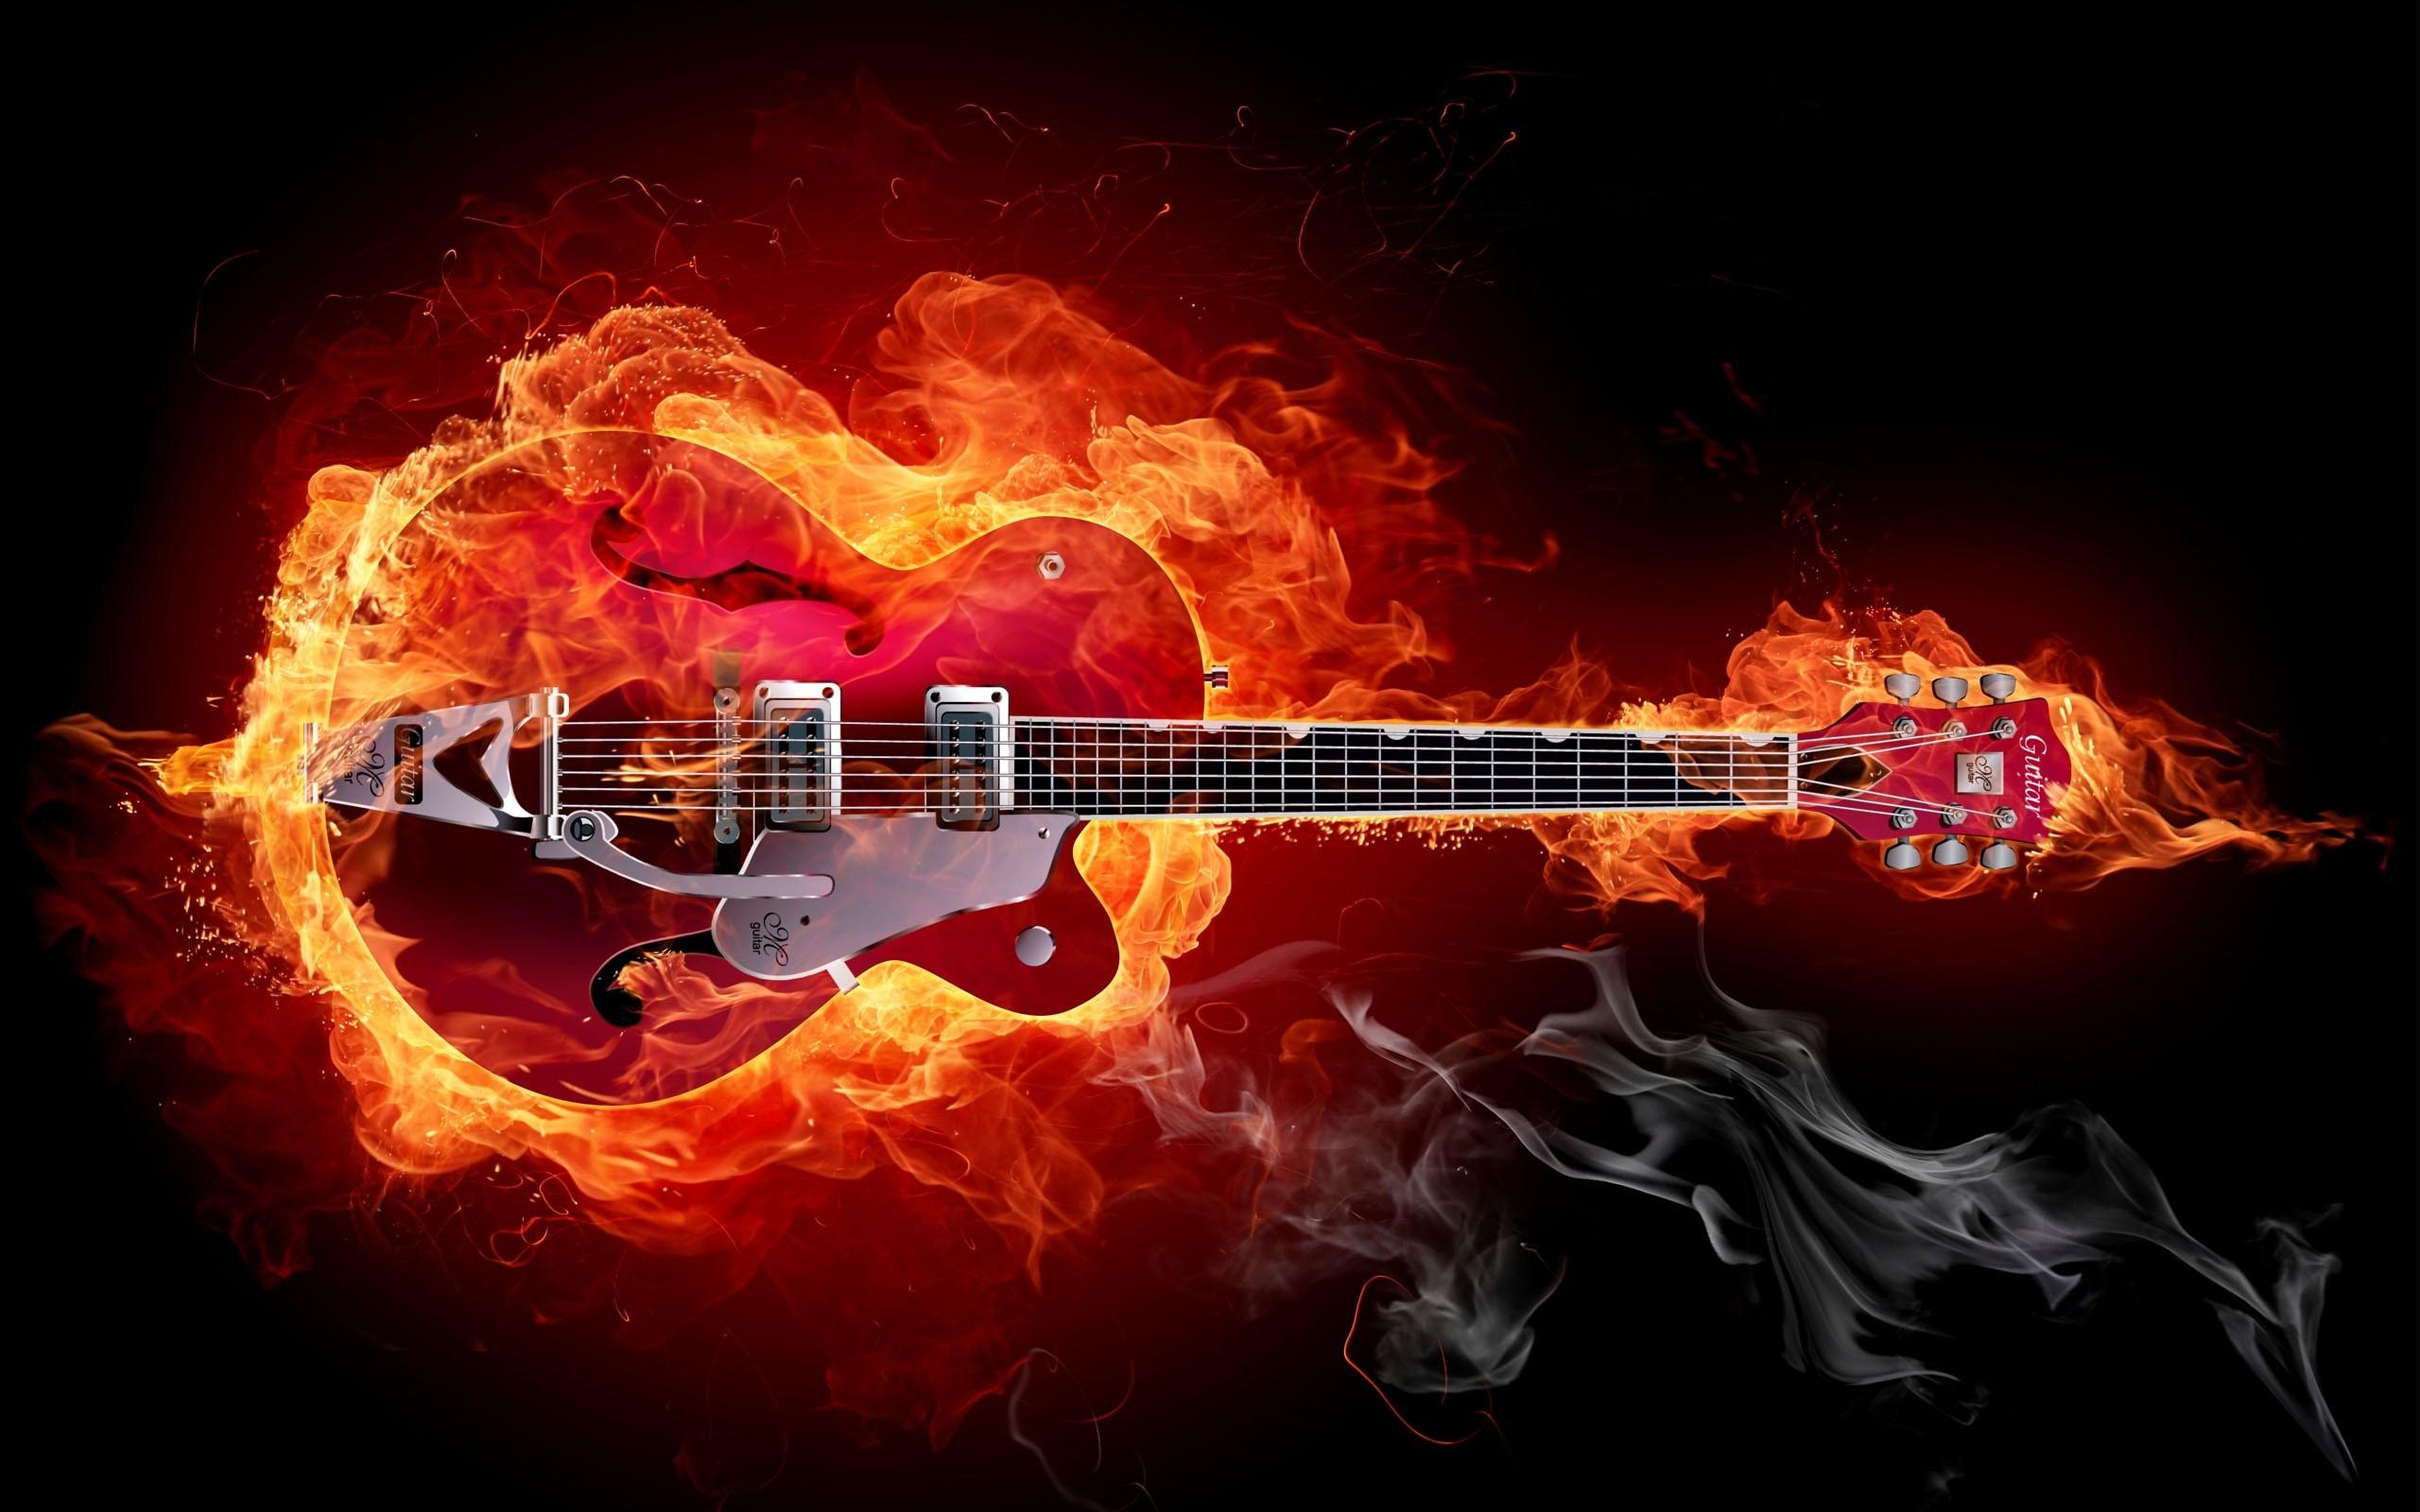 Rock Music Wallpaper 69 images